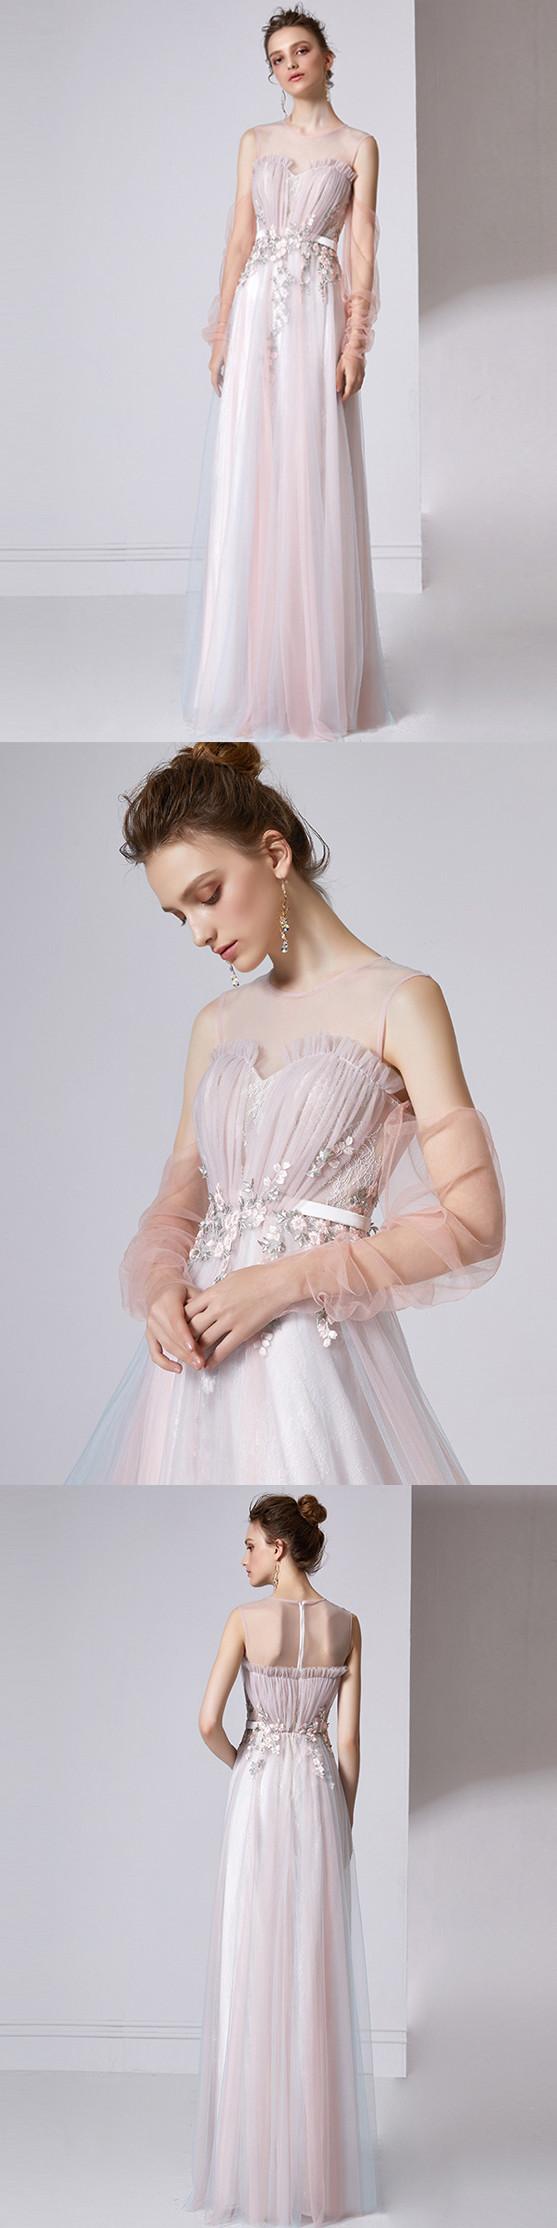 Aline scoop floorlength long sleeve tulle prom dressevening dress